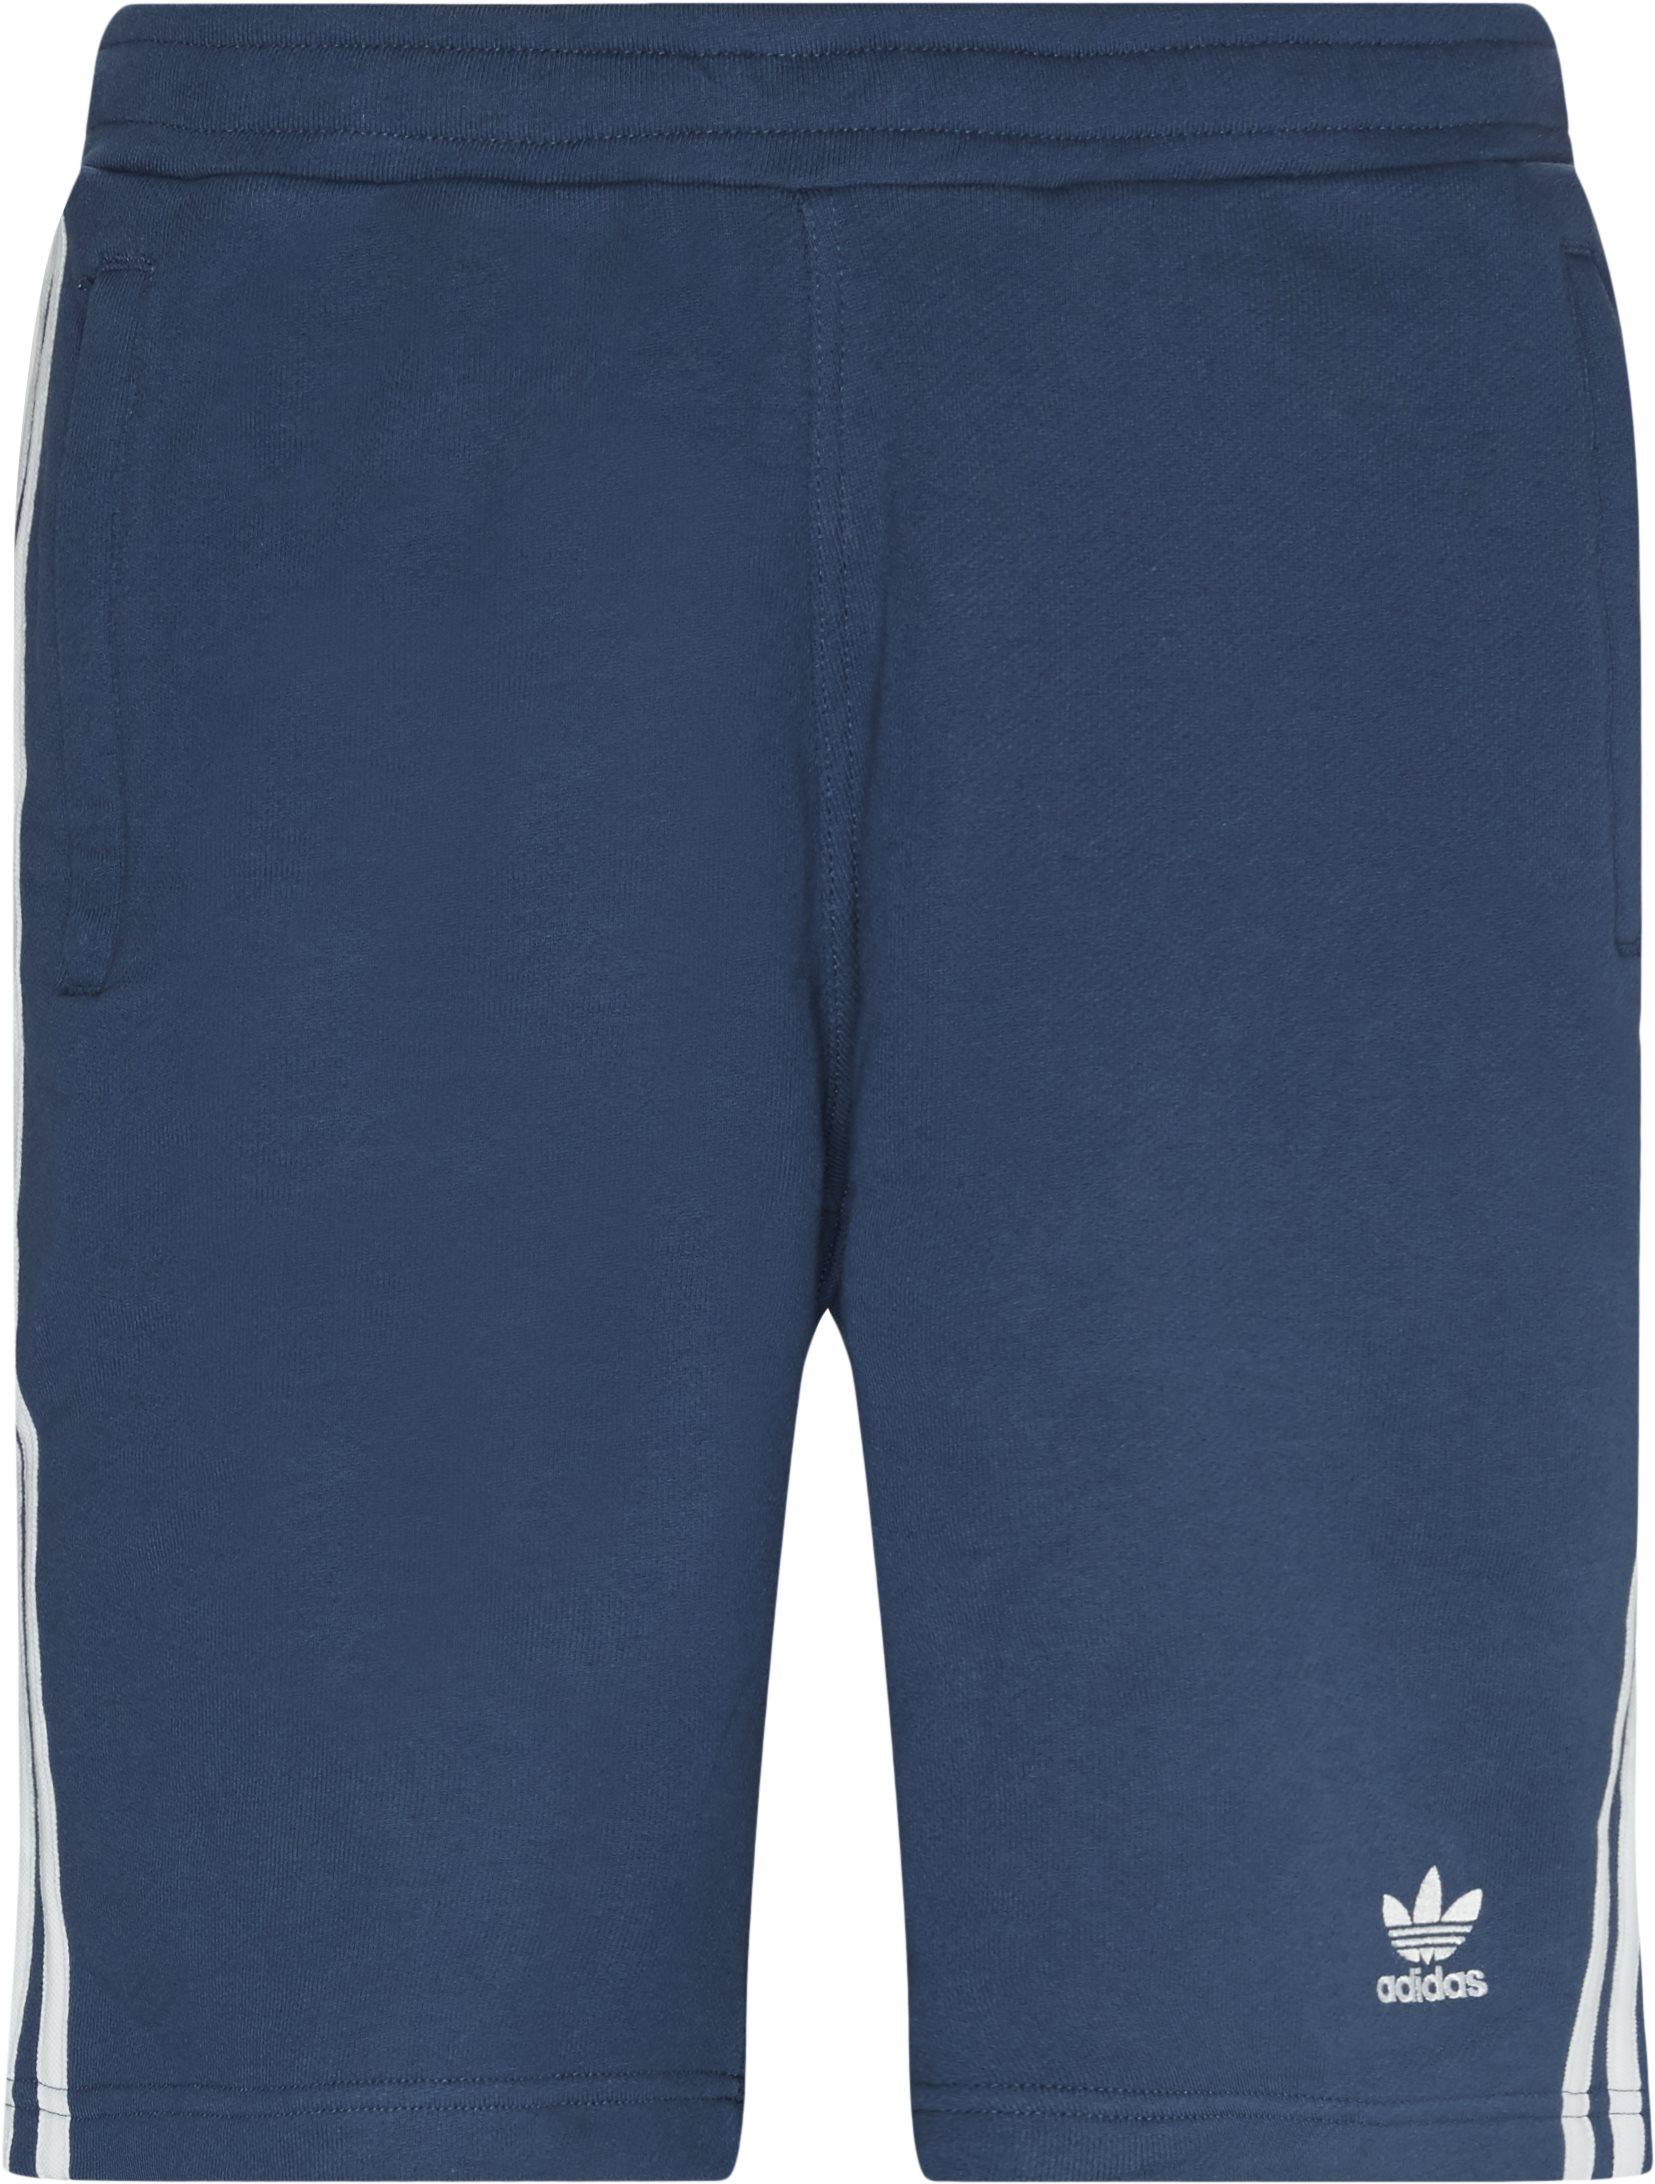 Shorts - Straight fit - Blå